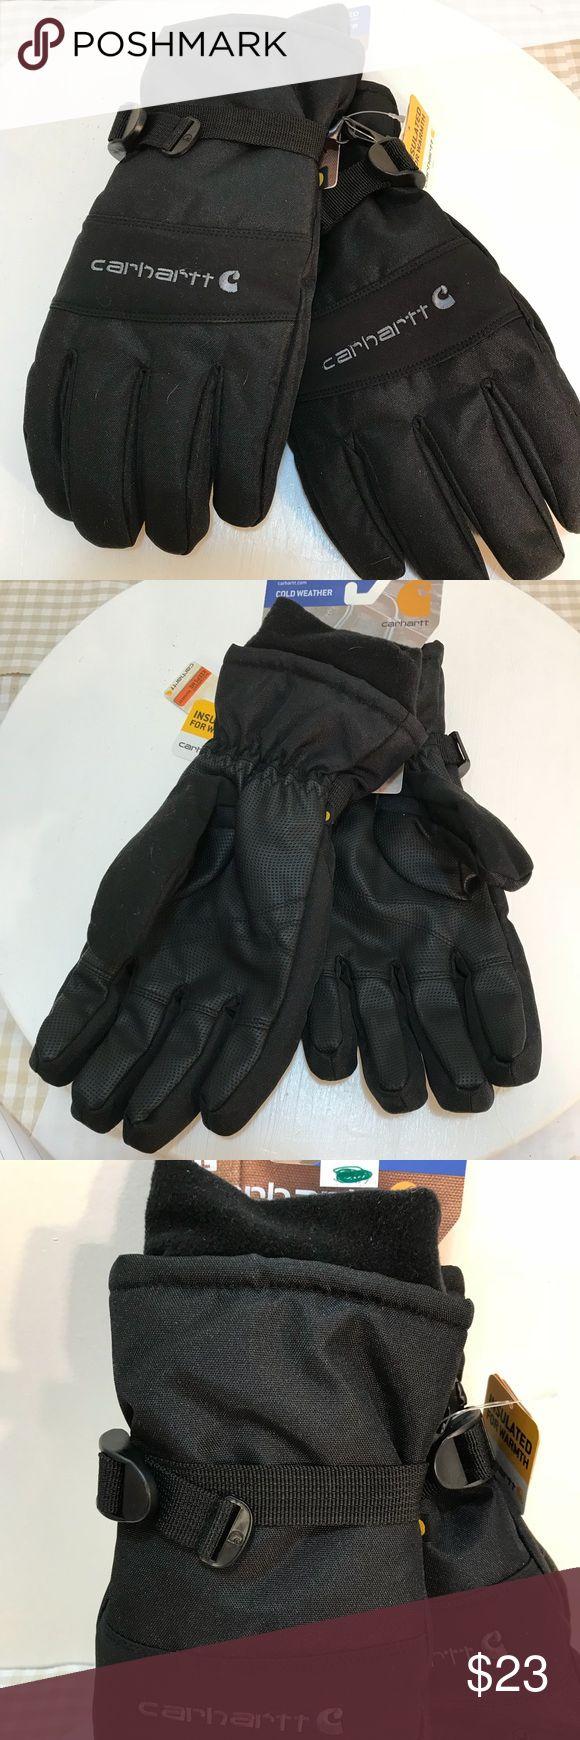 Carhartt A511 Mens Waterproof Gloves Lg Warmest level men's insulated waterproof gloves in black sweat wicking inside lining Carhartt Other